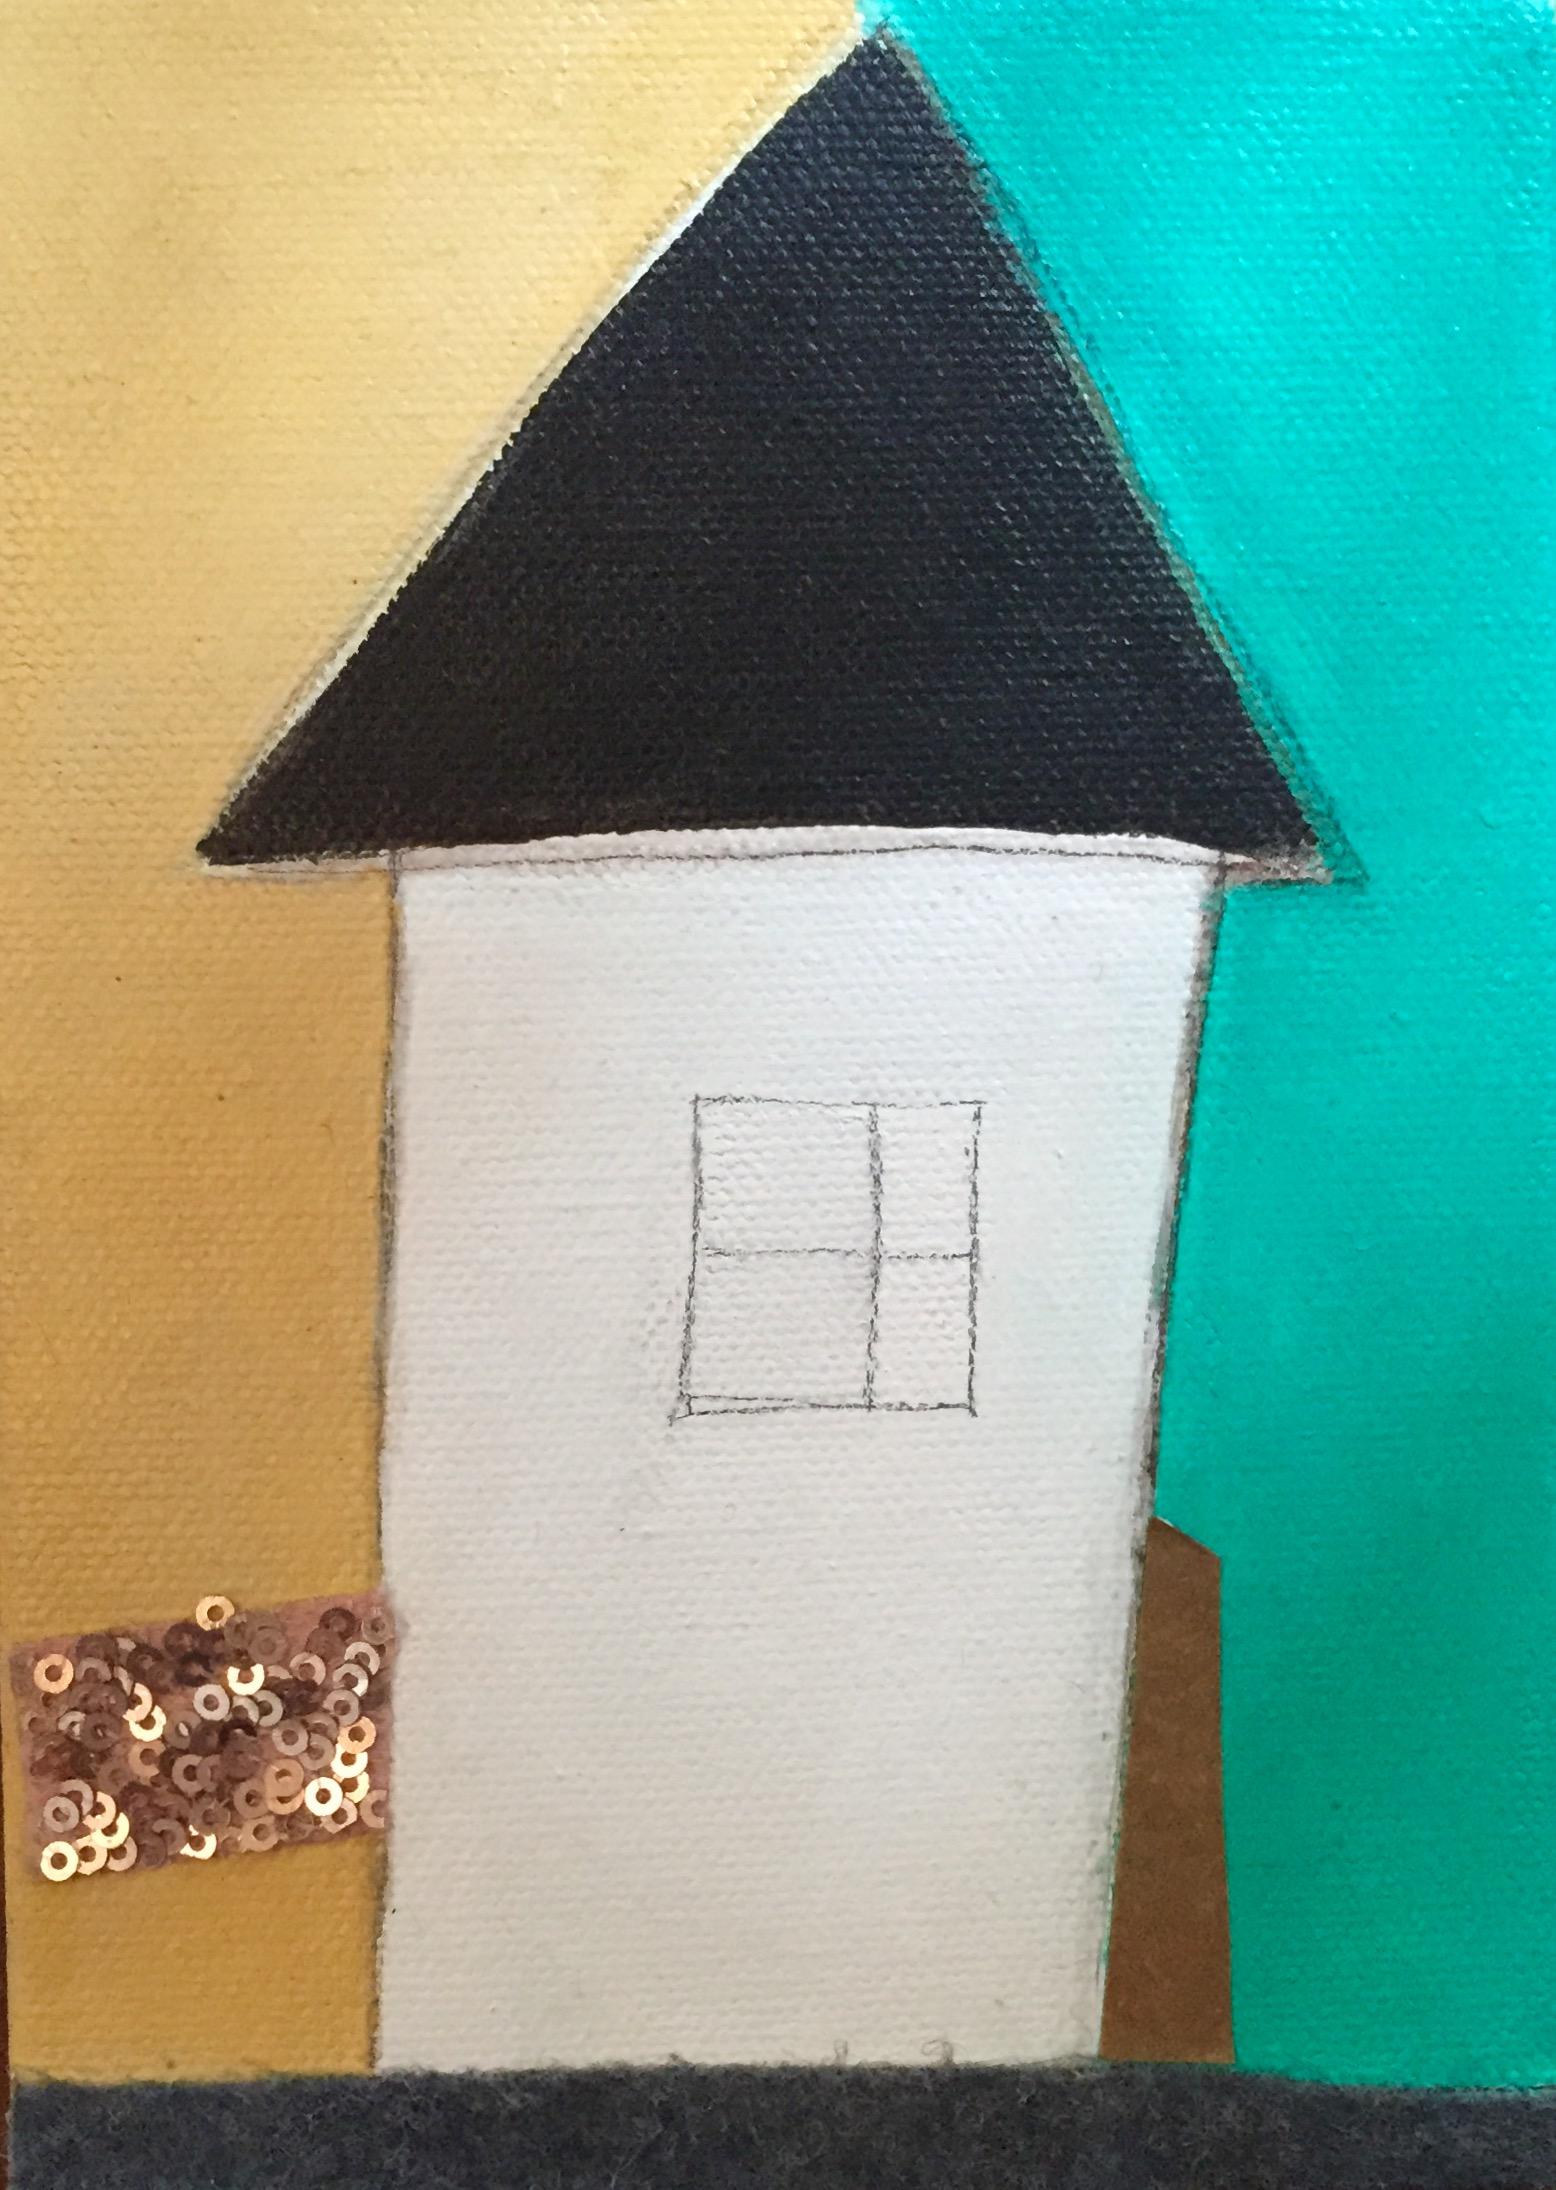 "Vicinity #9 , oil, acrylic, pencil, pastel, tape, sequins, felt, tar, shellac on canvas, 7"" x 5"", $275"